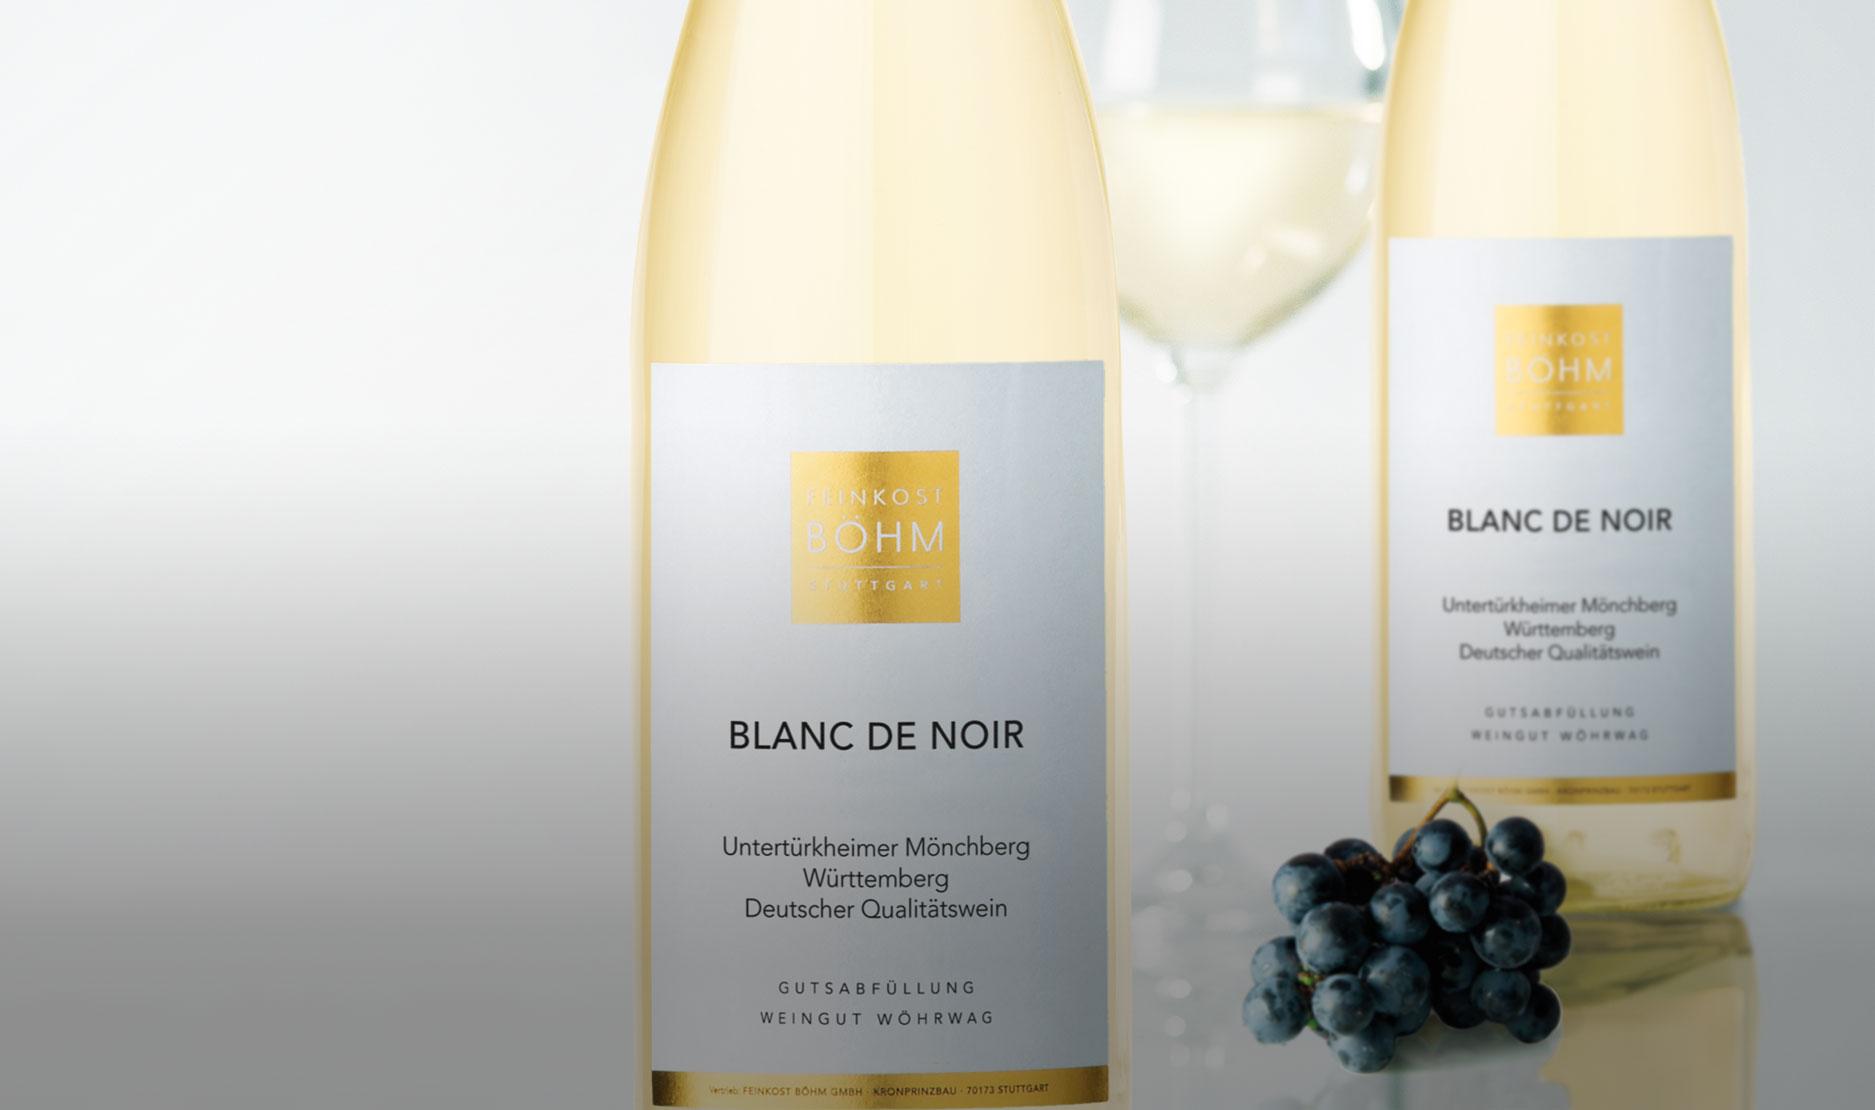 Feinkost Böhm Blanc de Noir